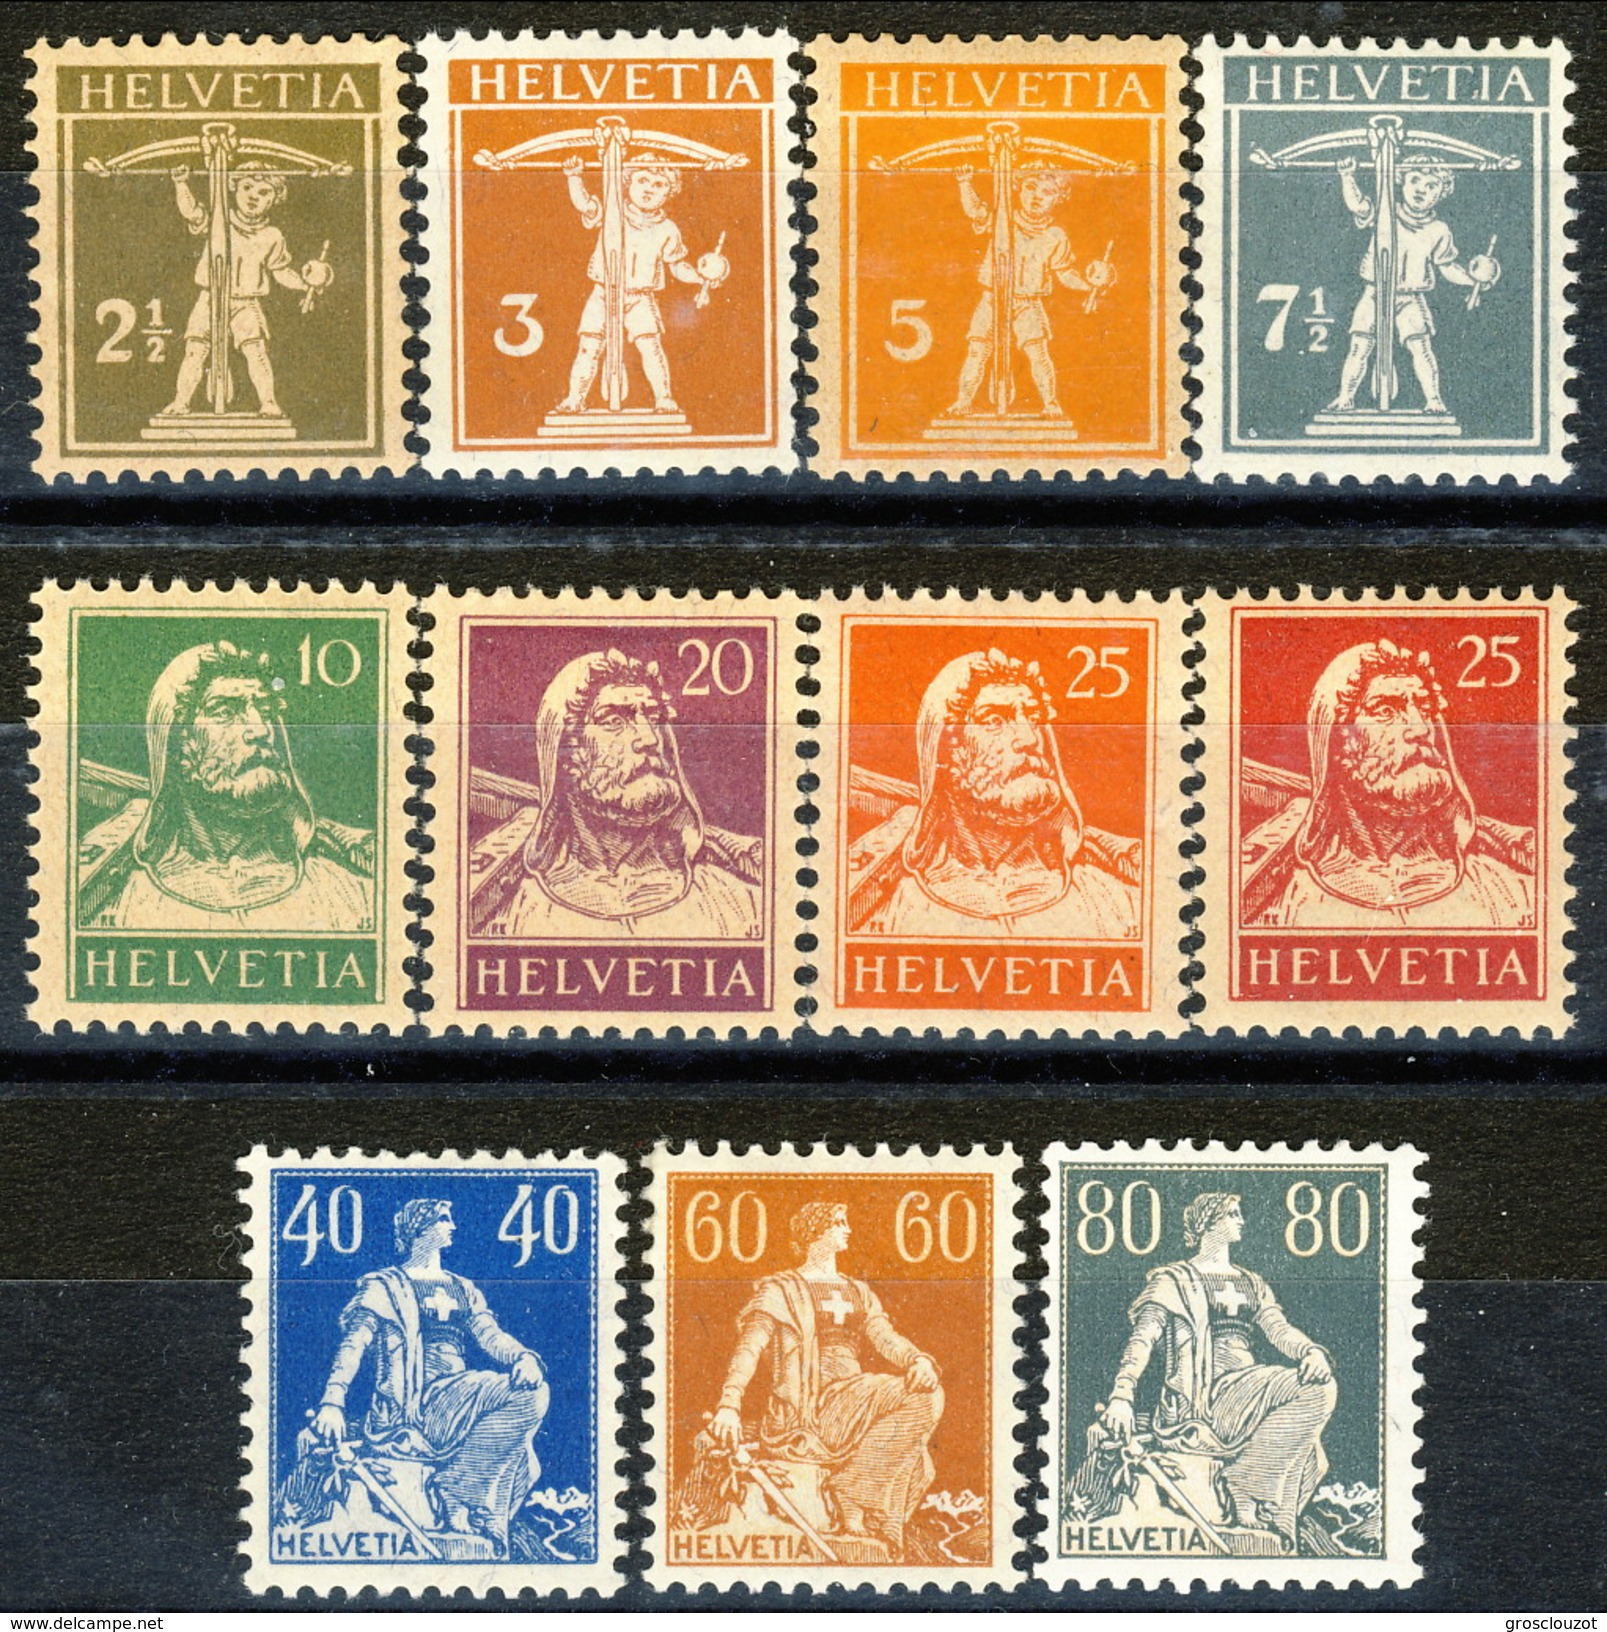 Svizzera 1916 - 22 Serietta N. 157 - 166 (11 Valori, Carta Ordinaria) MVLH Cat. € 180 - Nuovi